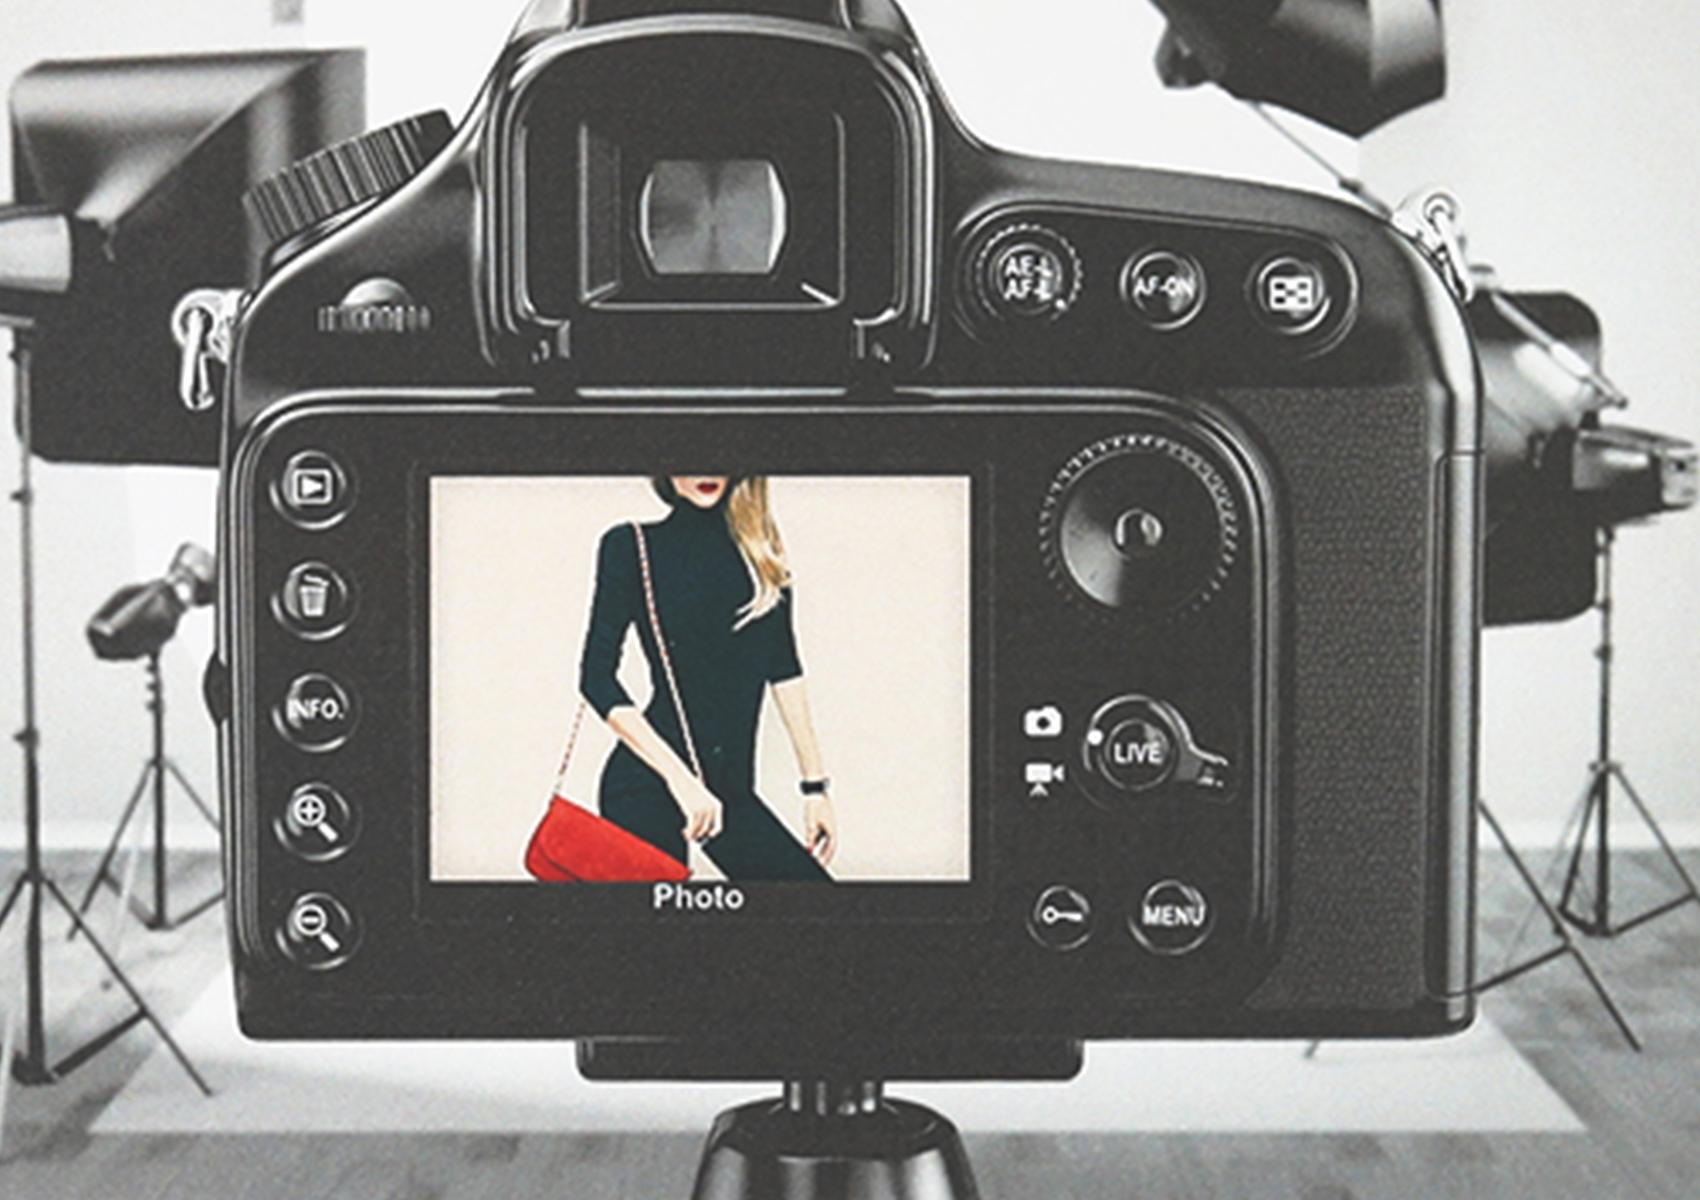 ofuna camera